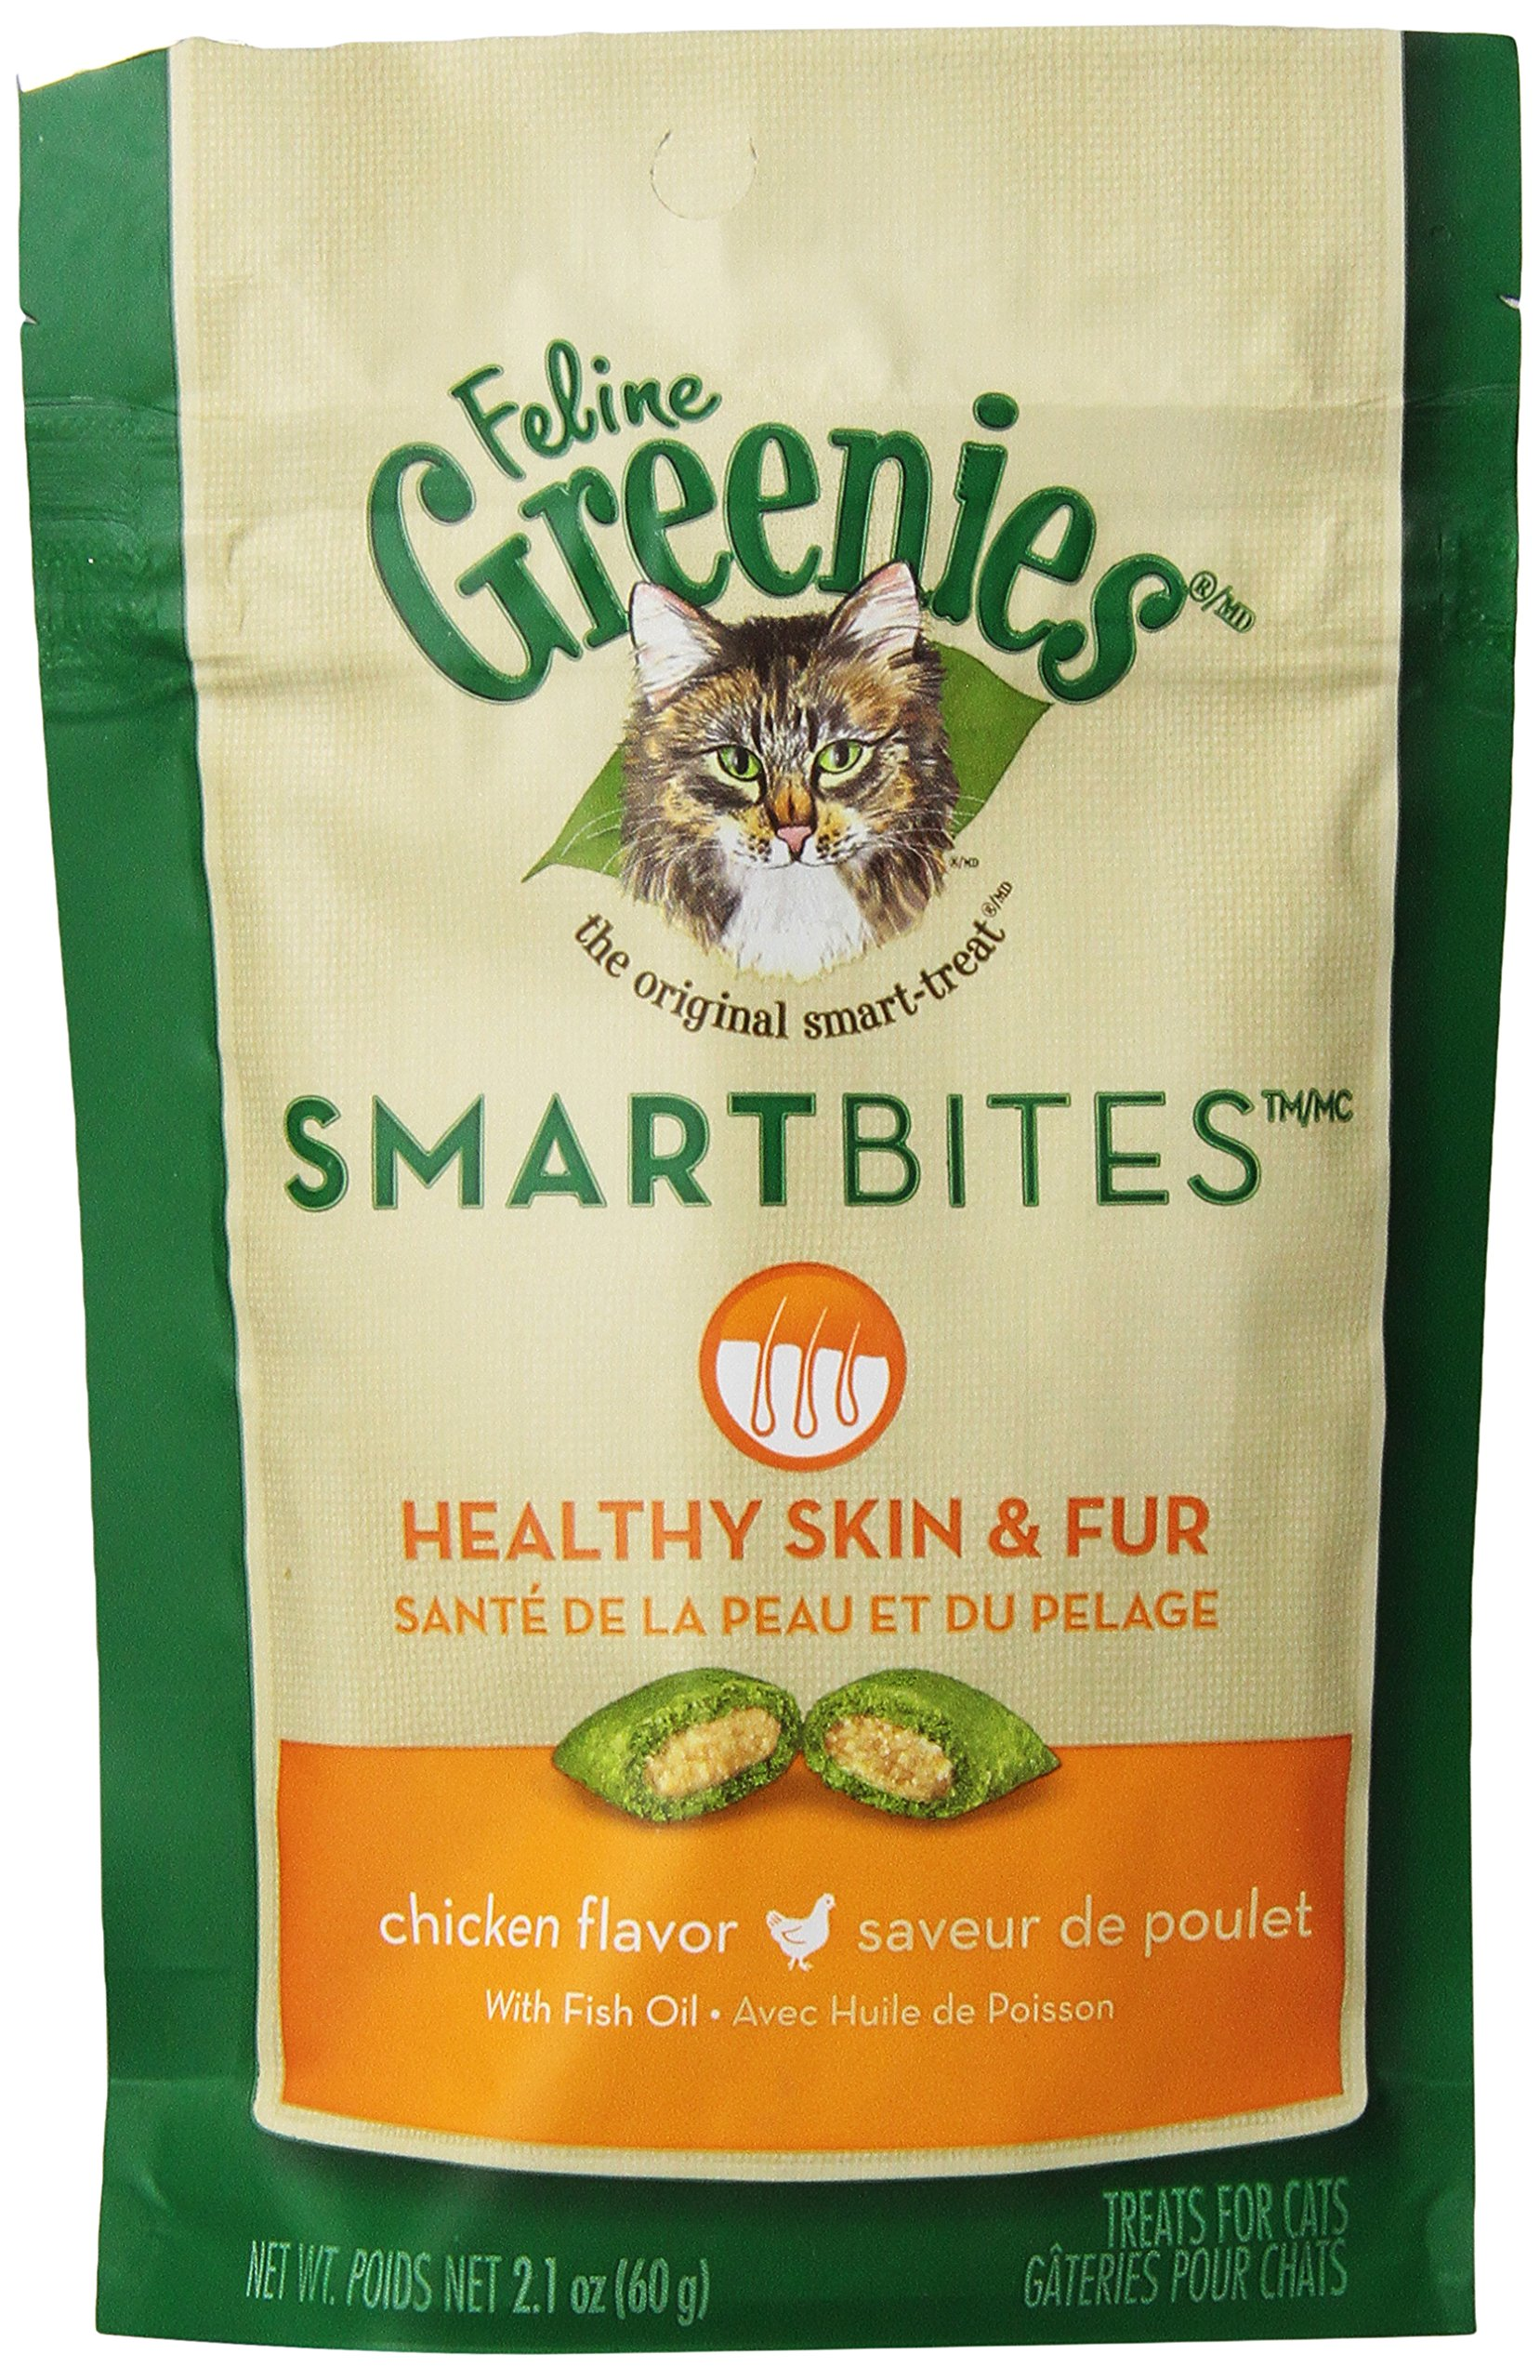 Feline Greenies 6-Pack Feline Smart Bites Treat, Skin And Fur Chicken, 2.1-Ounce by Greenies